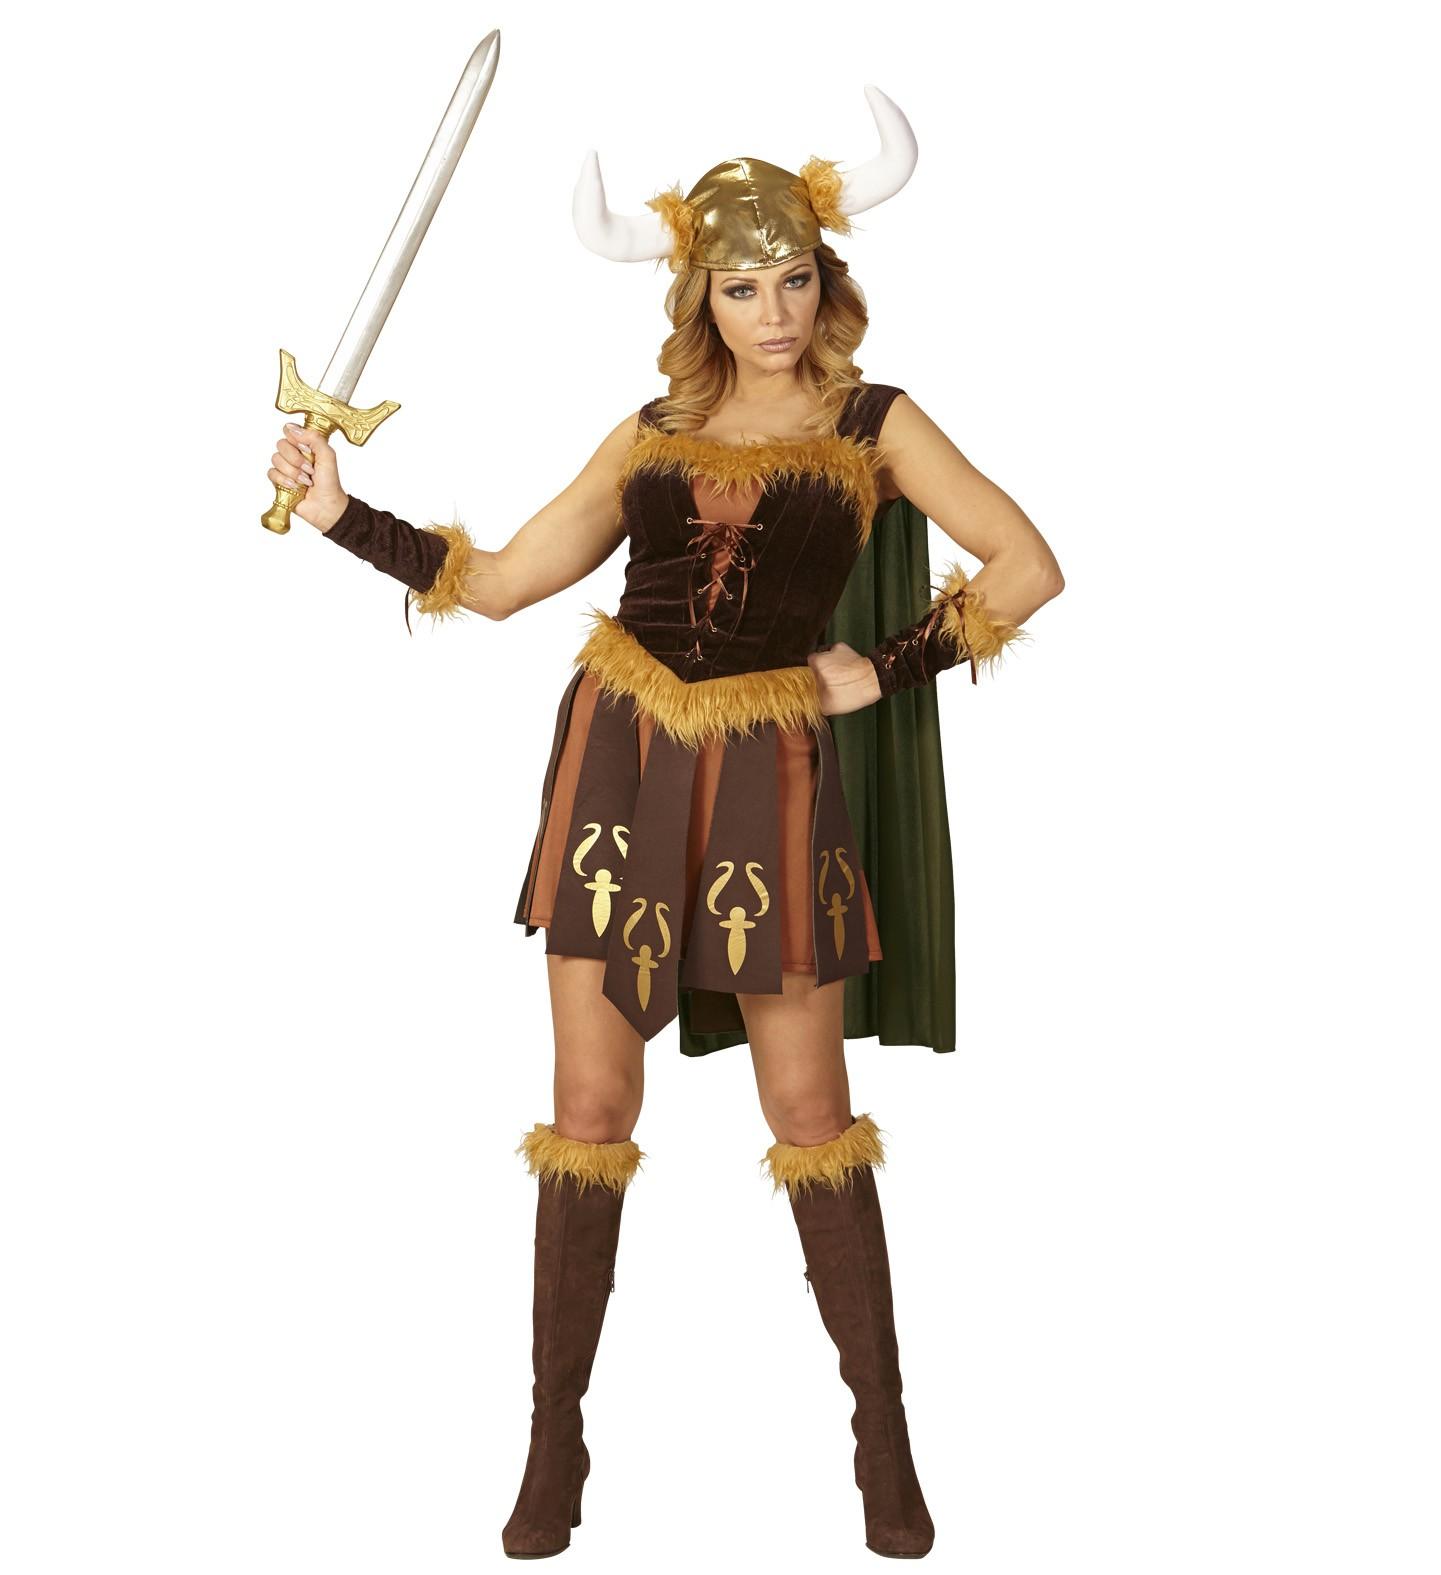 kvinder i vikingetiden